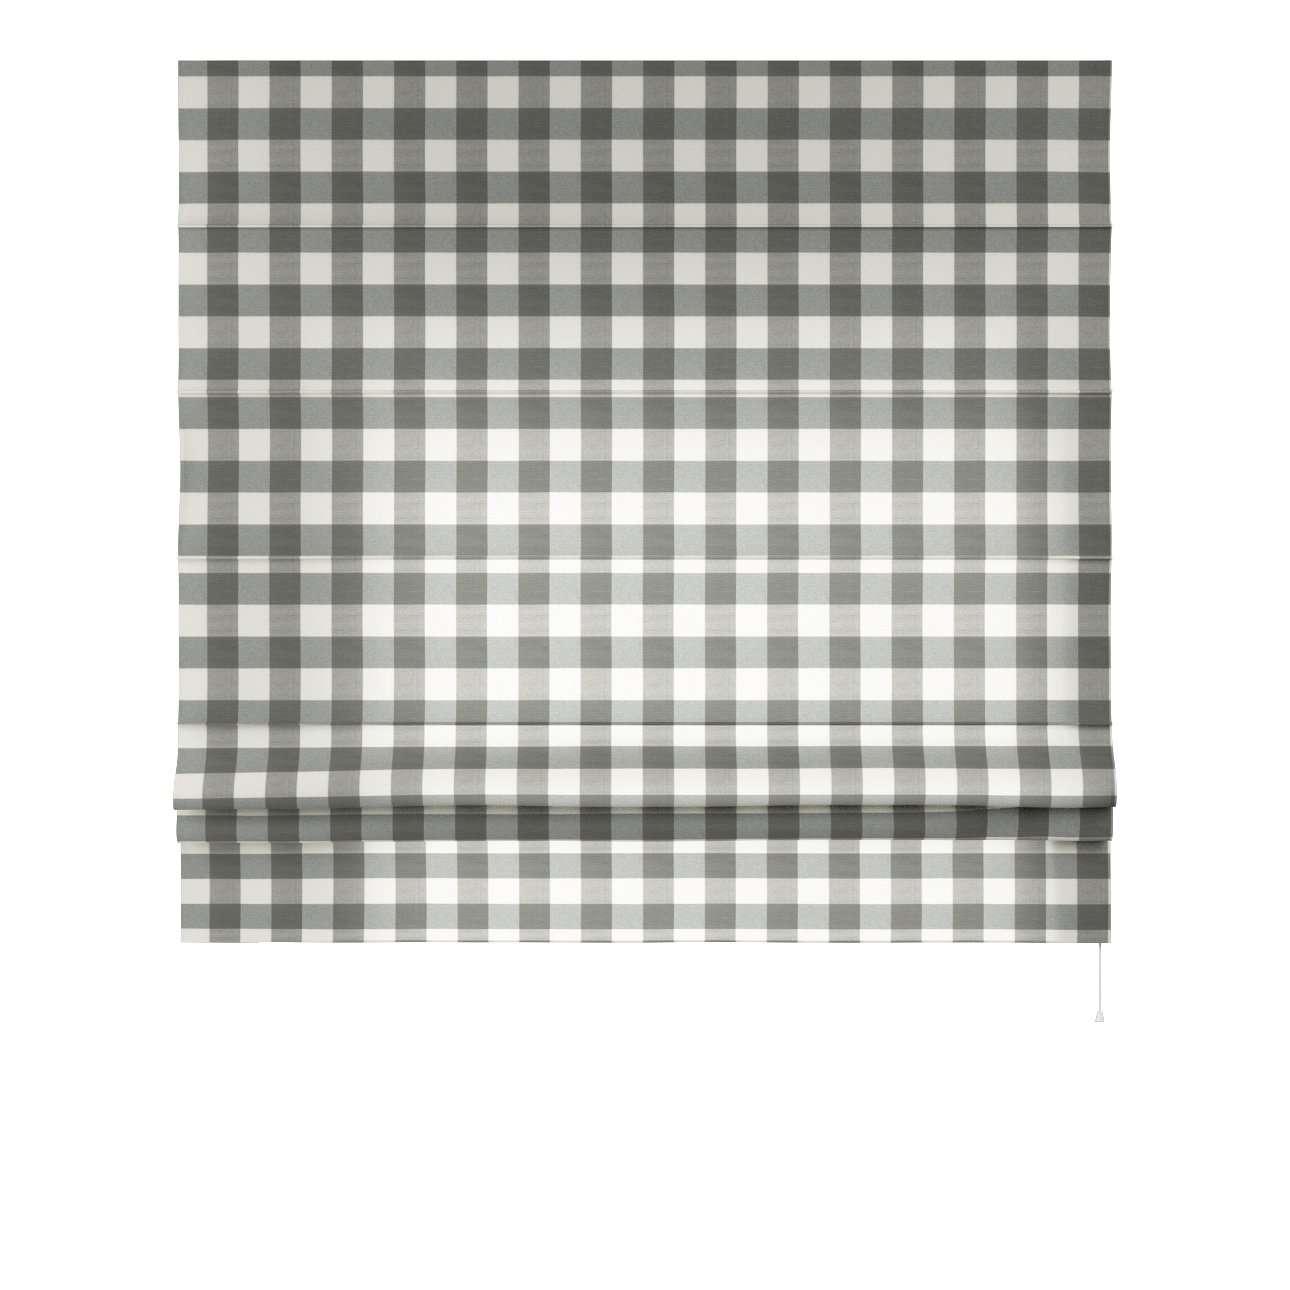 Raffrollo Padva 80 x 170 cm von der Kollektion Quadro, Stoff: 136-13